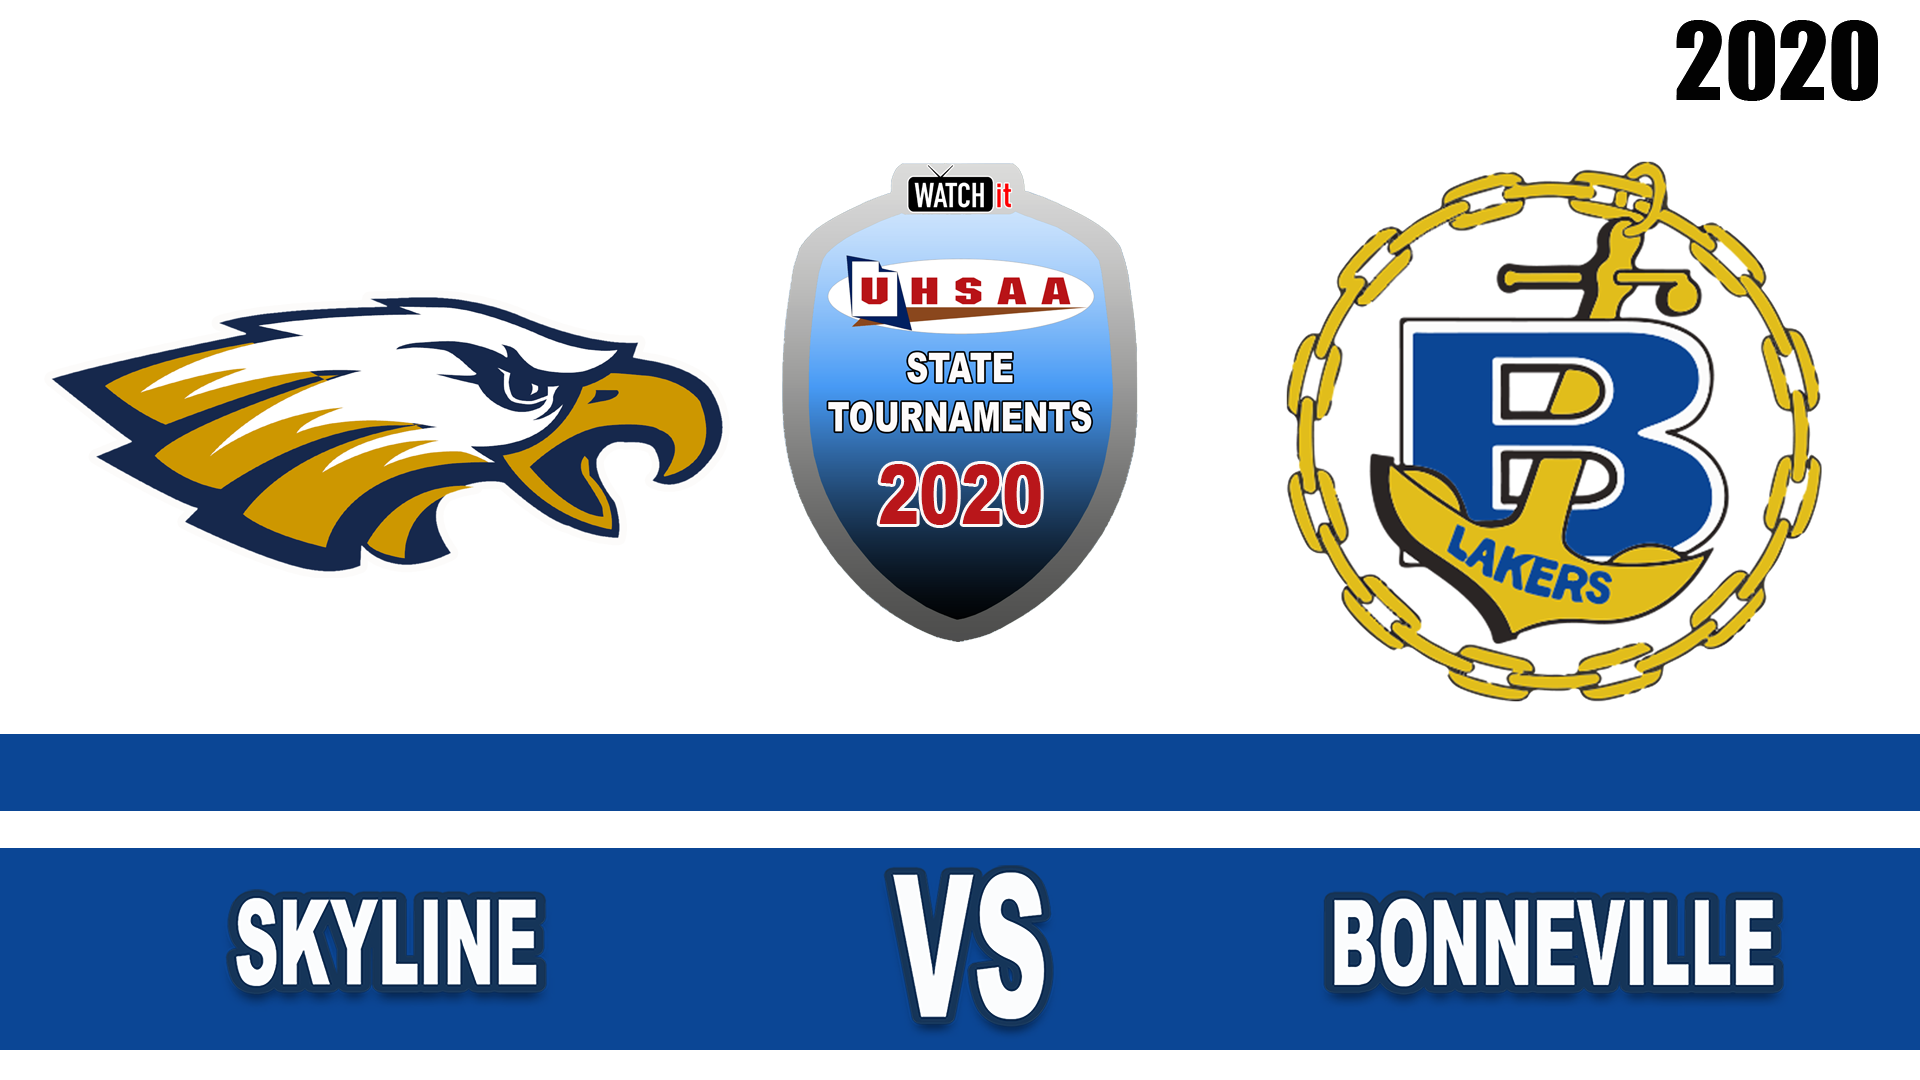 Skyline vs Bonneville